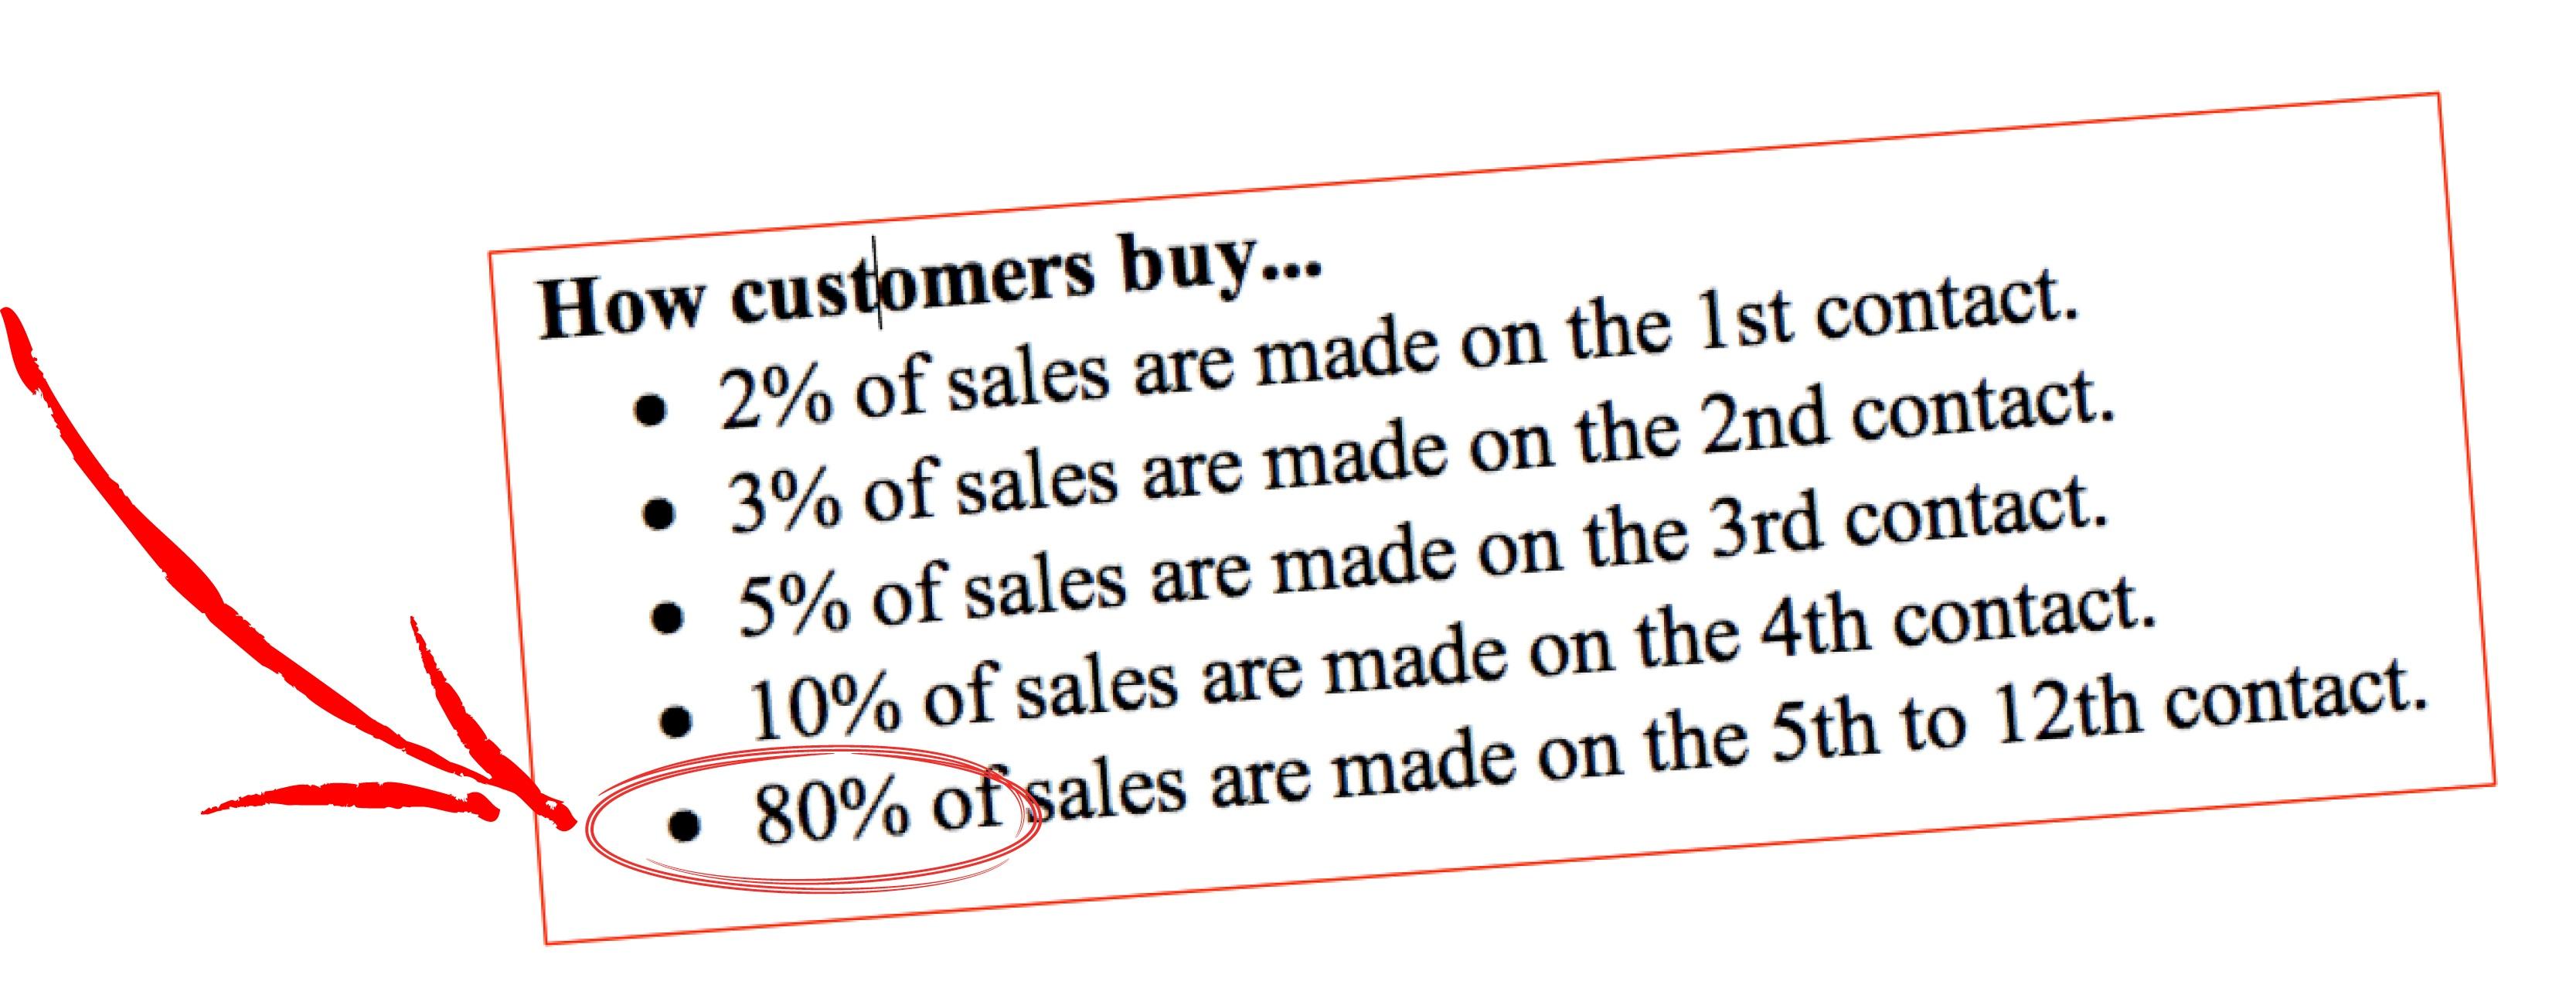 How customers buy full.jpg